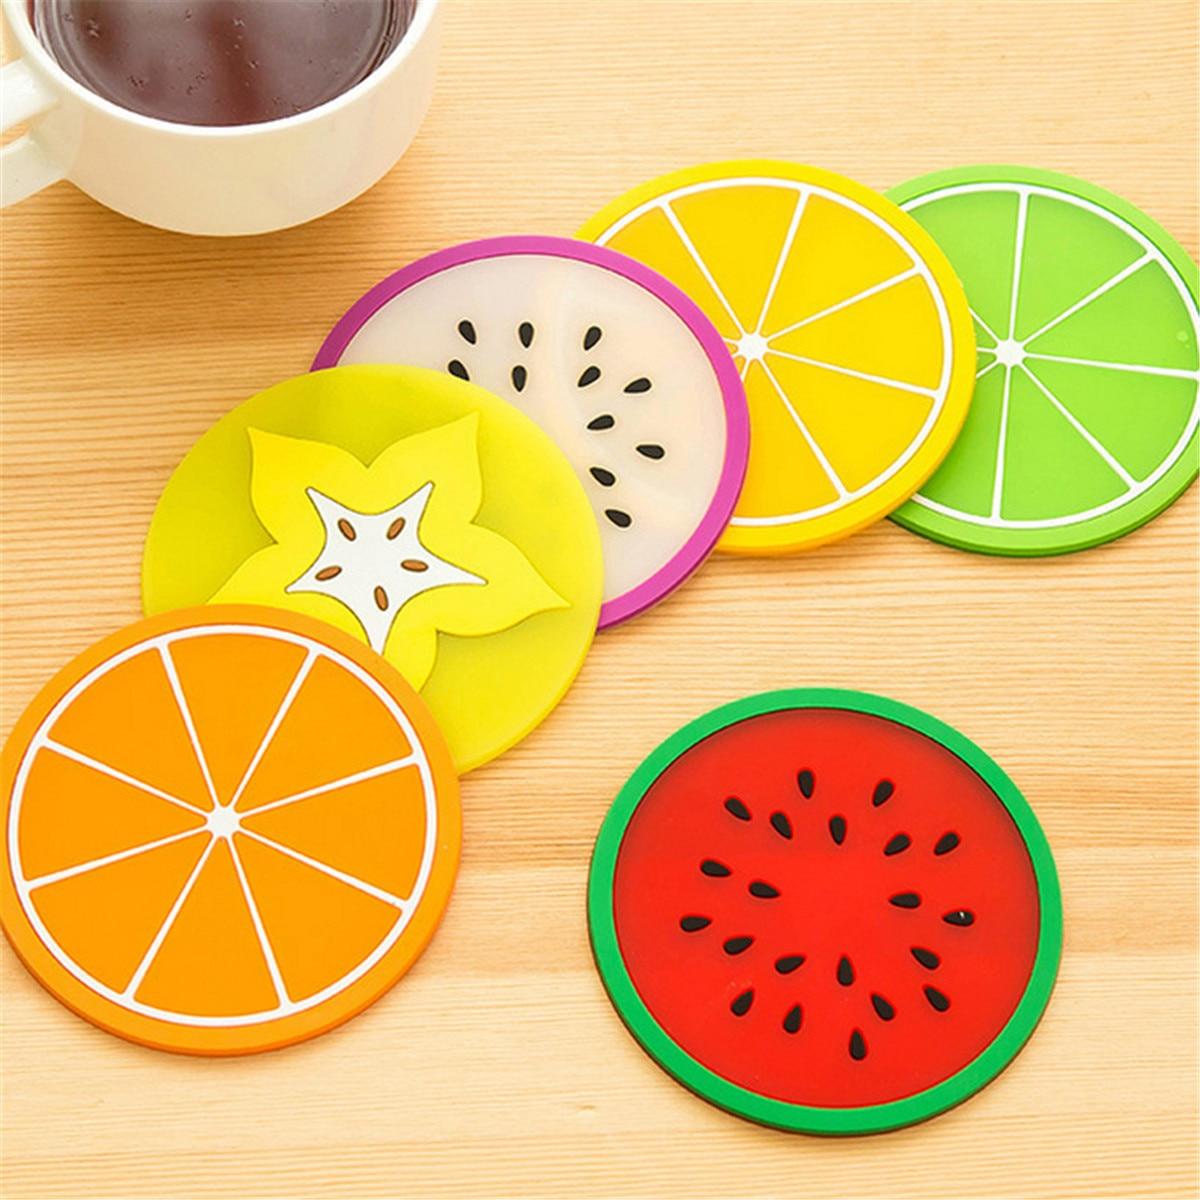 6Pcs Random Color Cute Fruits Coaster Novelty Cup Cushion Holder Mat Home Dining Room Table